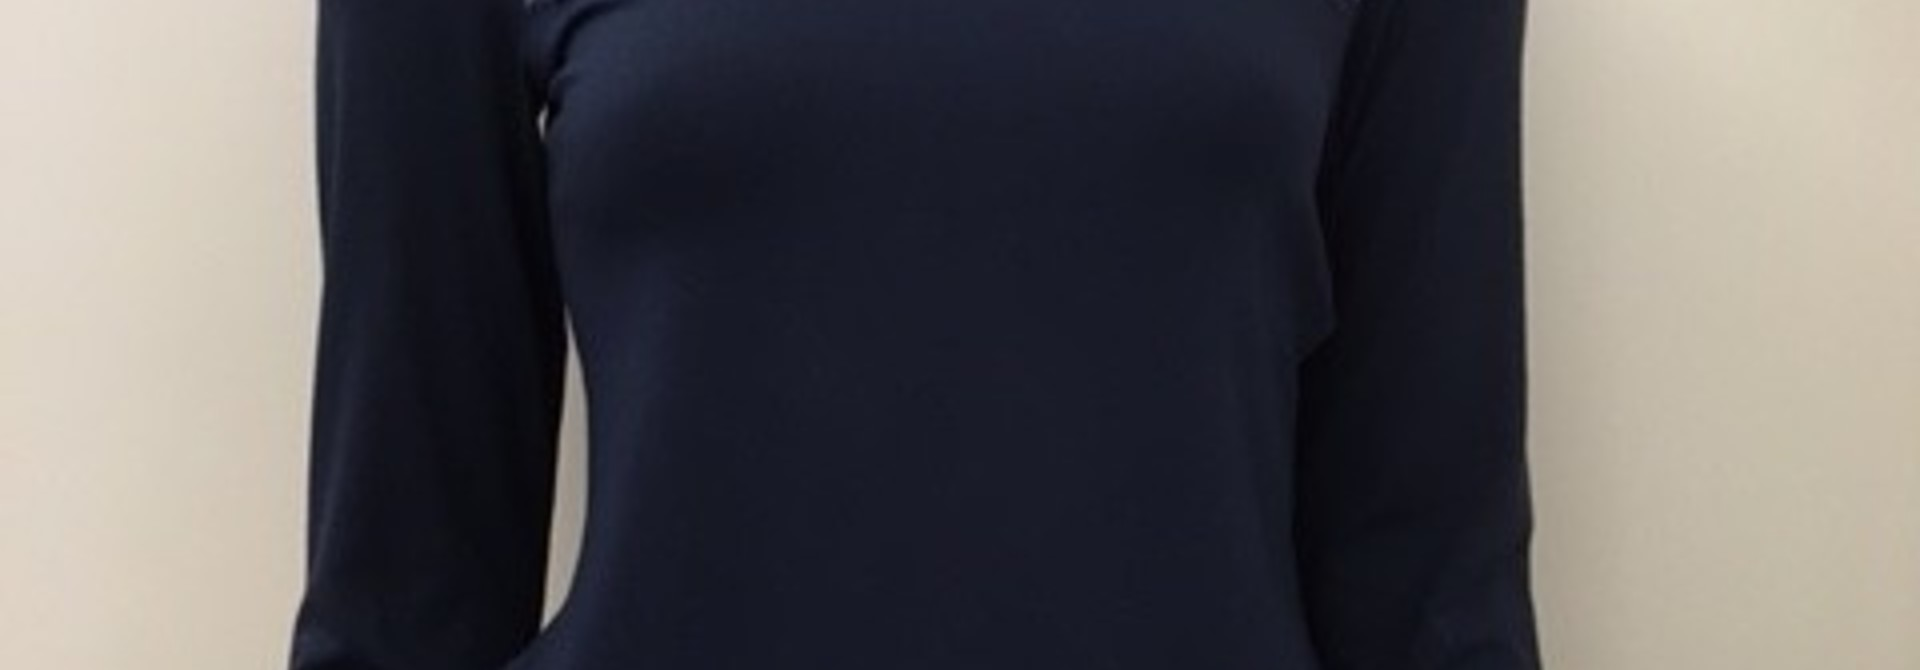 T-Shirt met kant lange mouw Greta 1045578 - atlantic